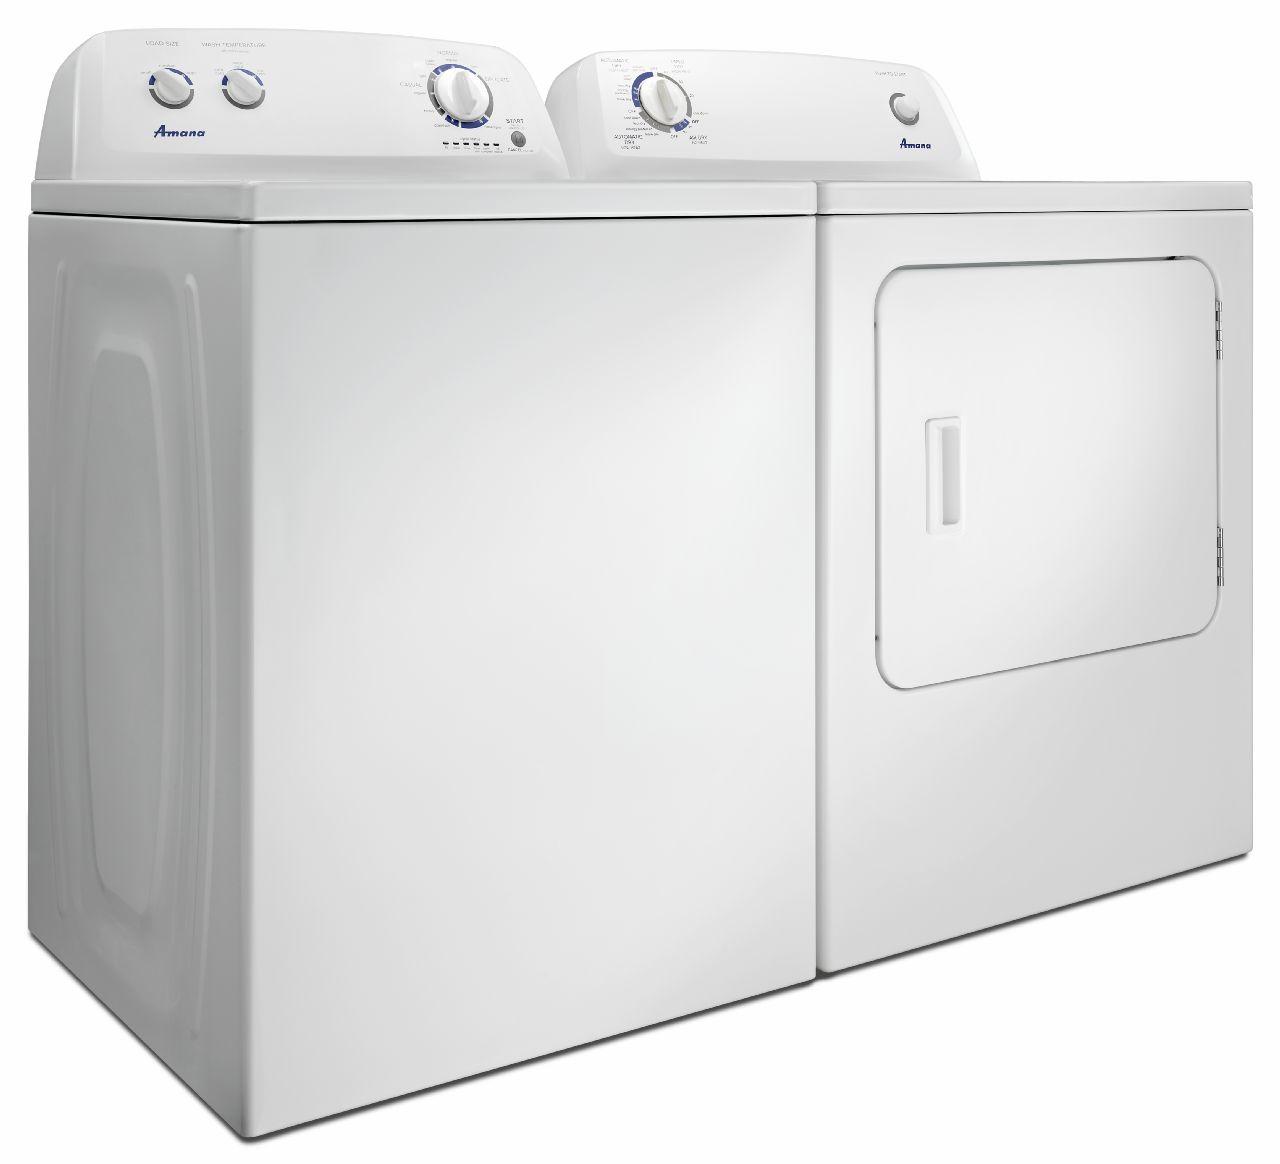 Amana Washer & Electric Dryer Pair NTW44516fW & NED4655EW